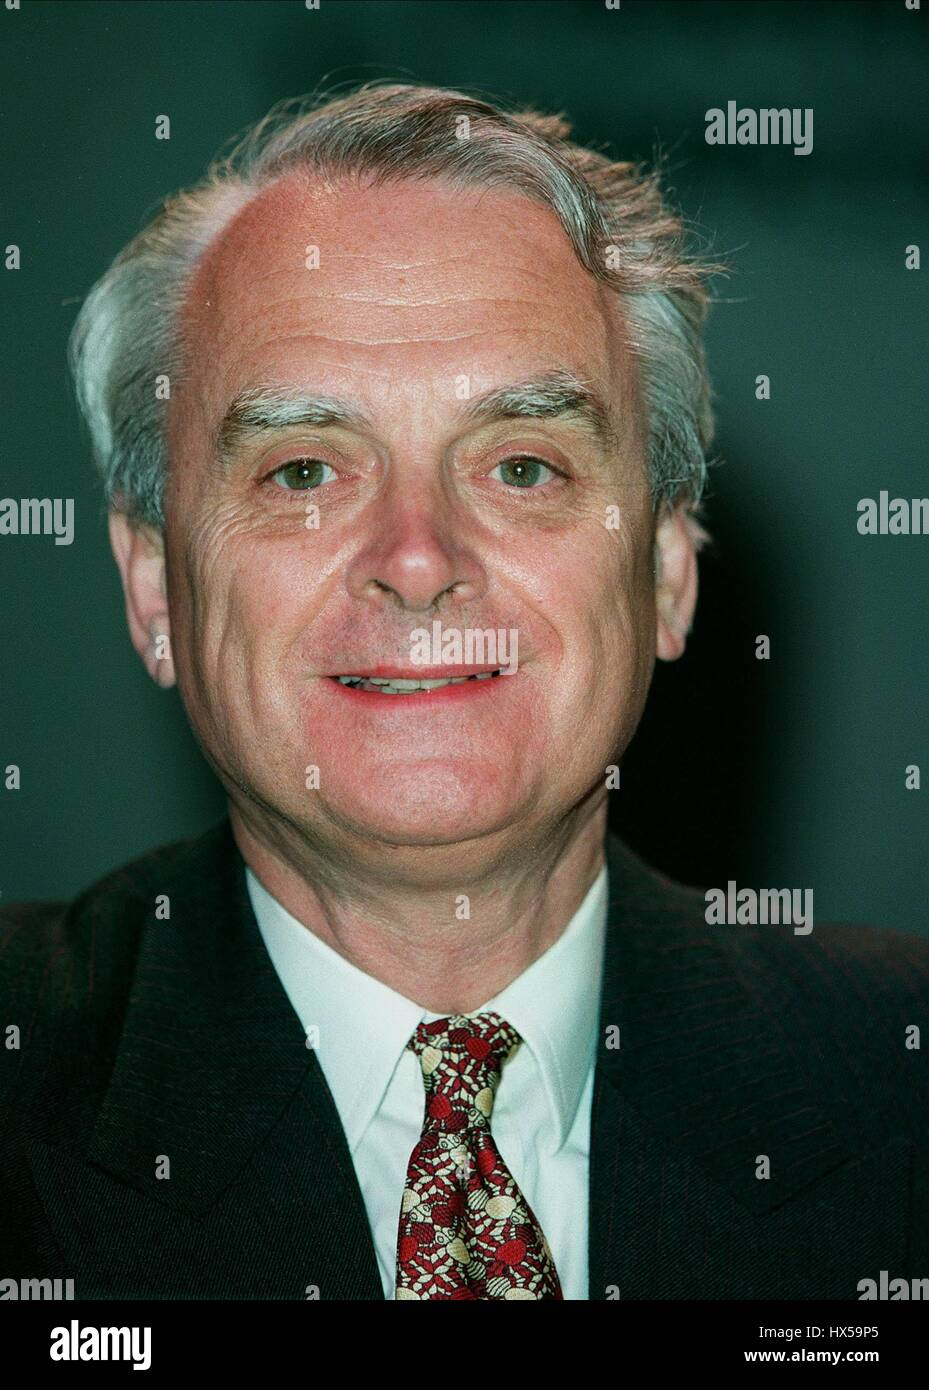 ROBERT MACLENNAN MP PRES. LIBERAL DEMOCRATS 17 October 1997 - Stock Image